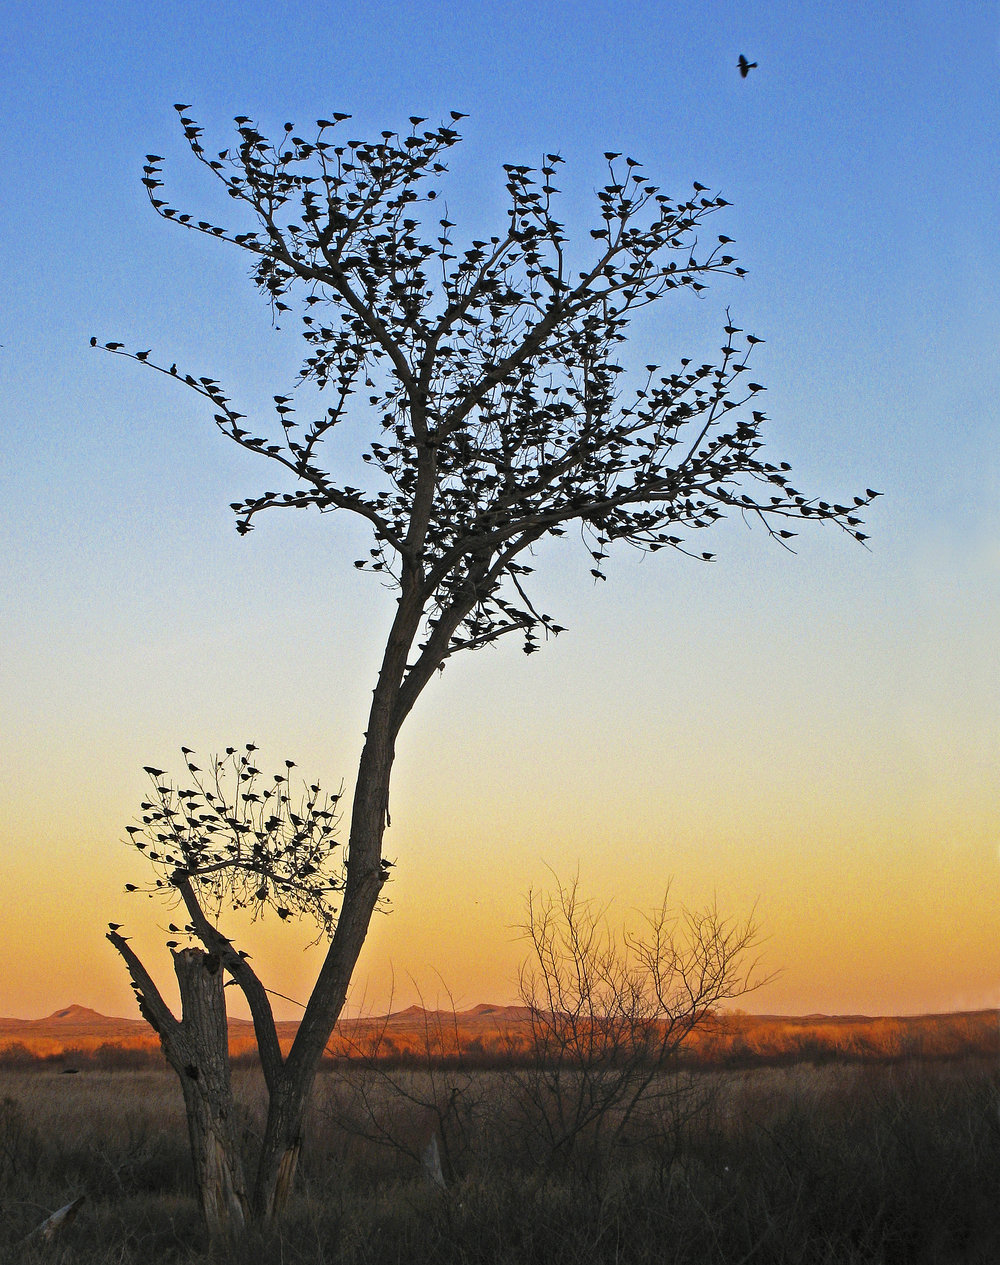 1 - Tree